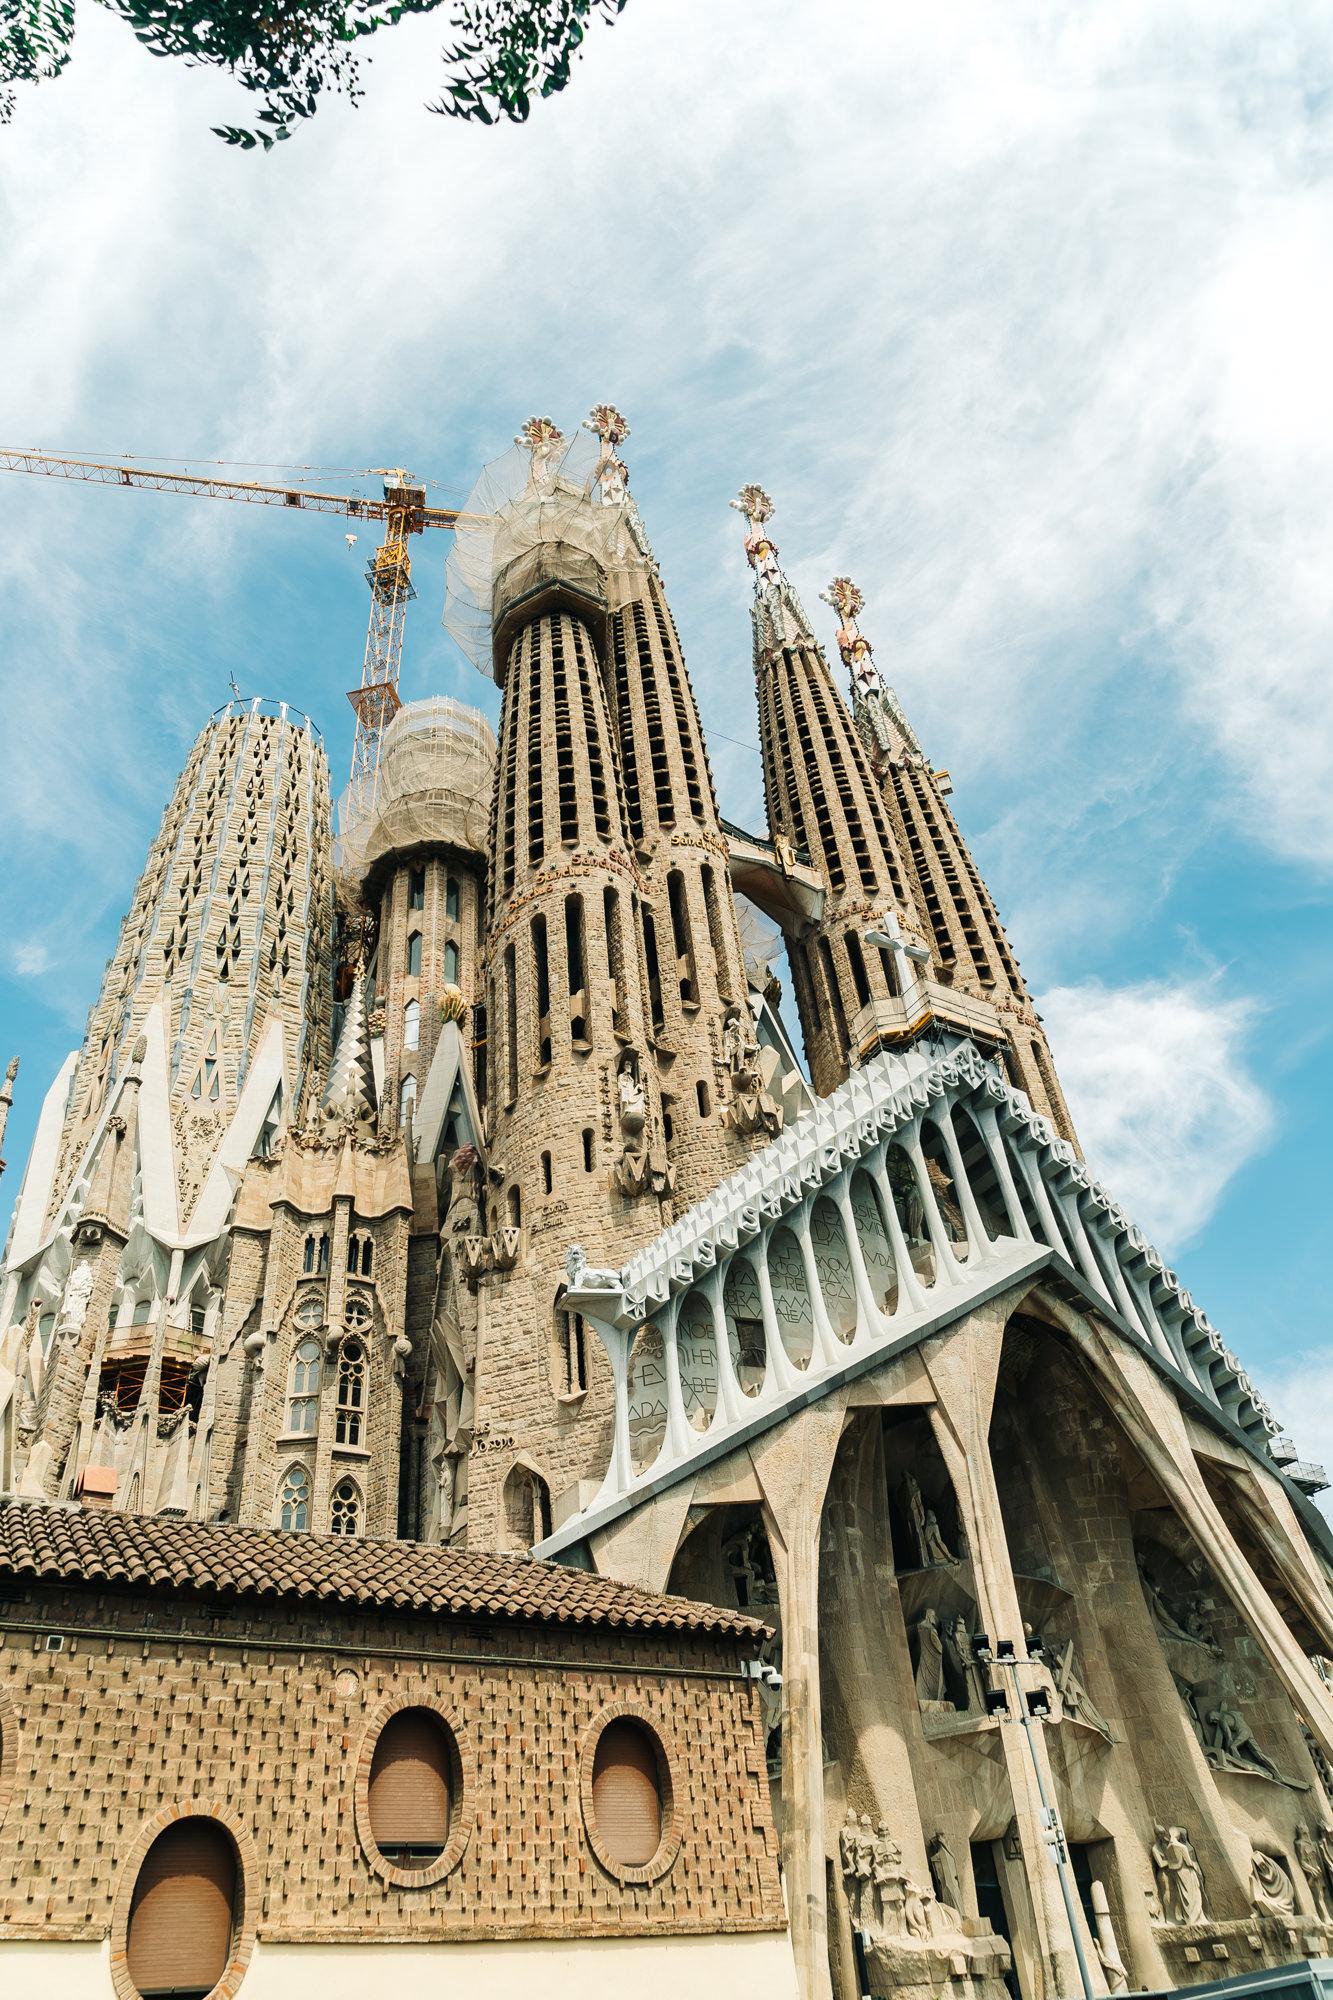 La Sagrada Familia - the defining work of Antoni Gaudi